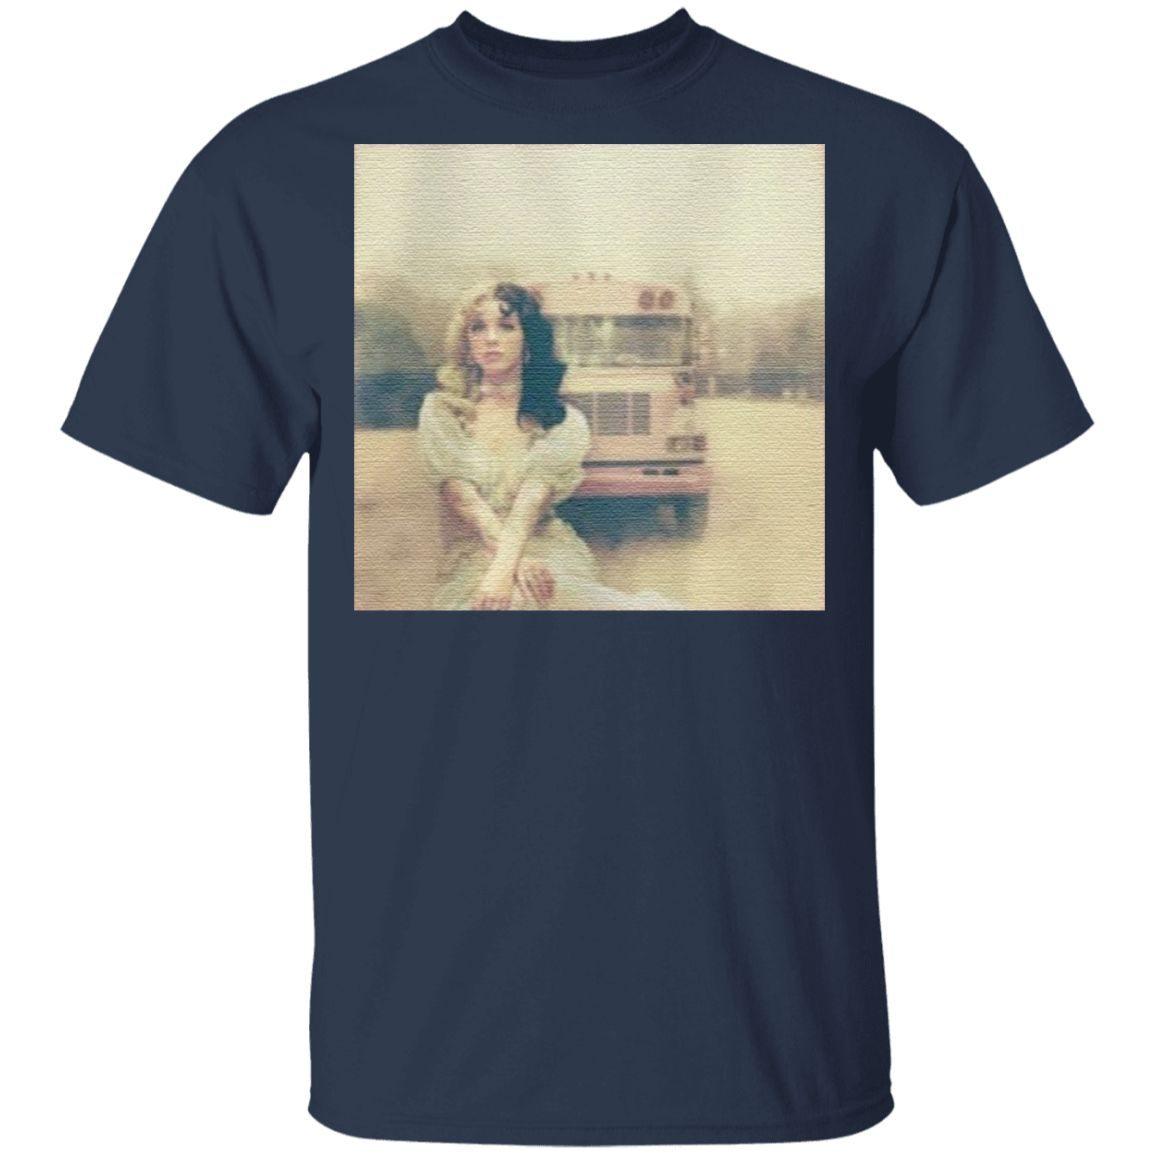 Melanie martinez classic t shirt